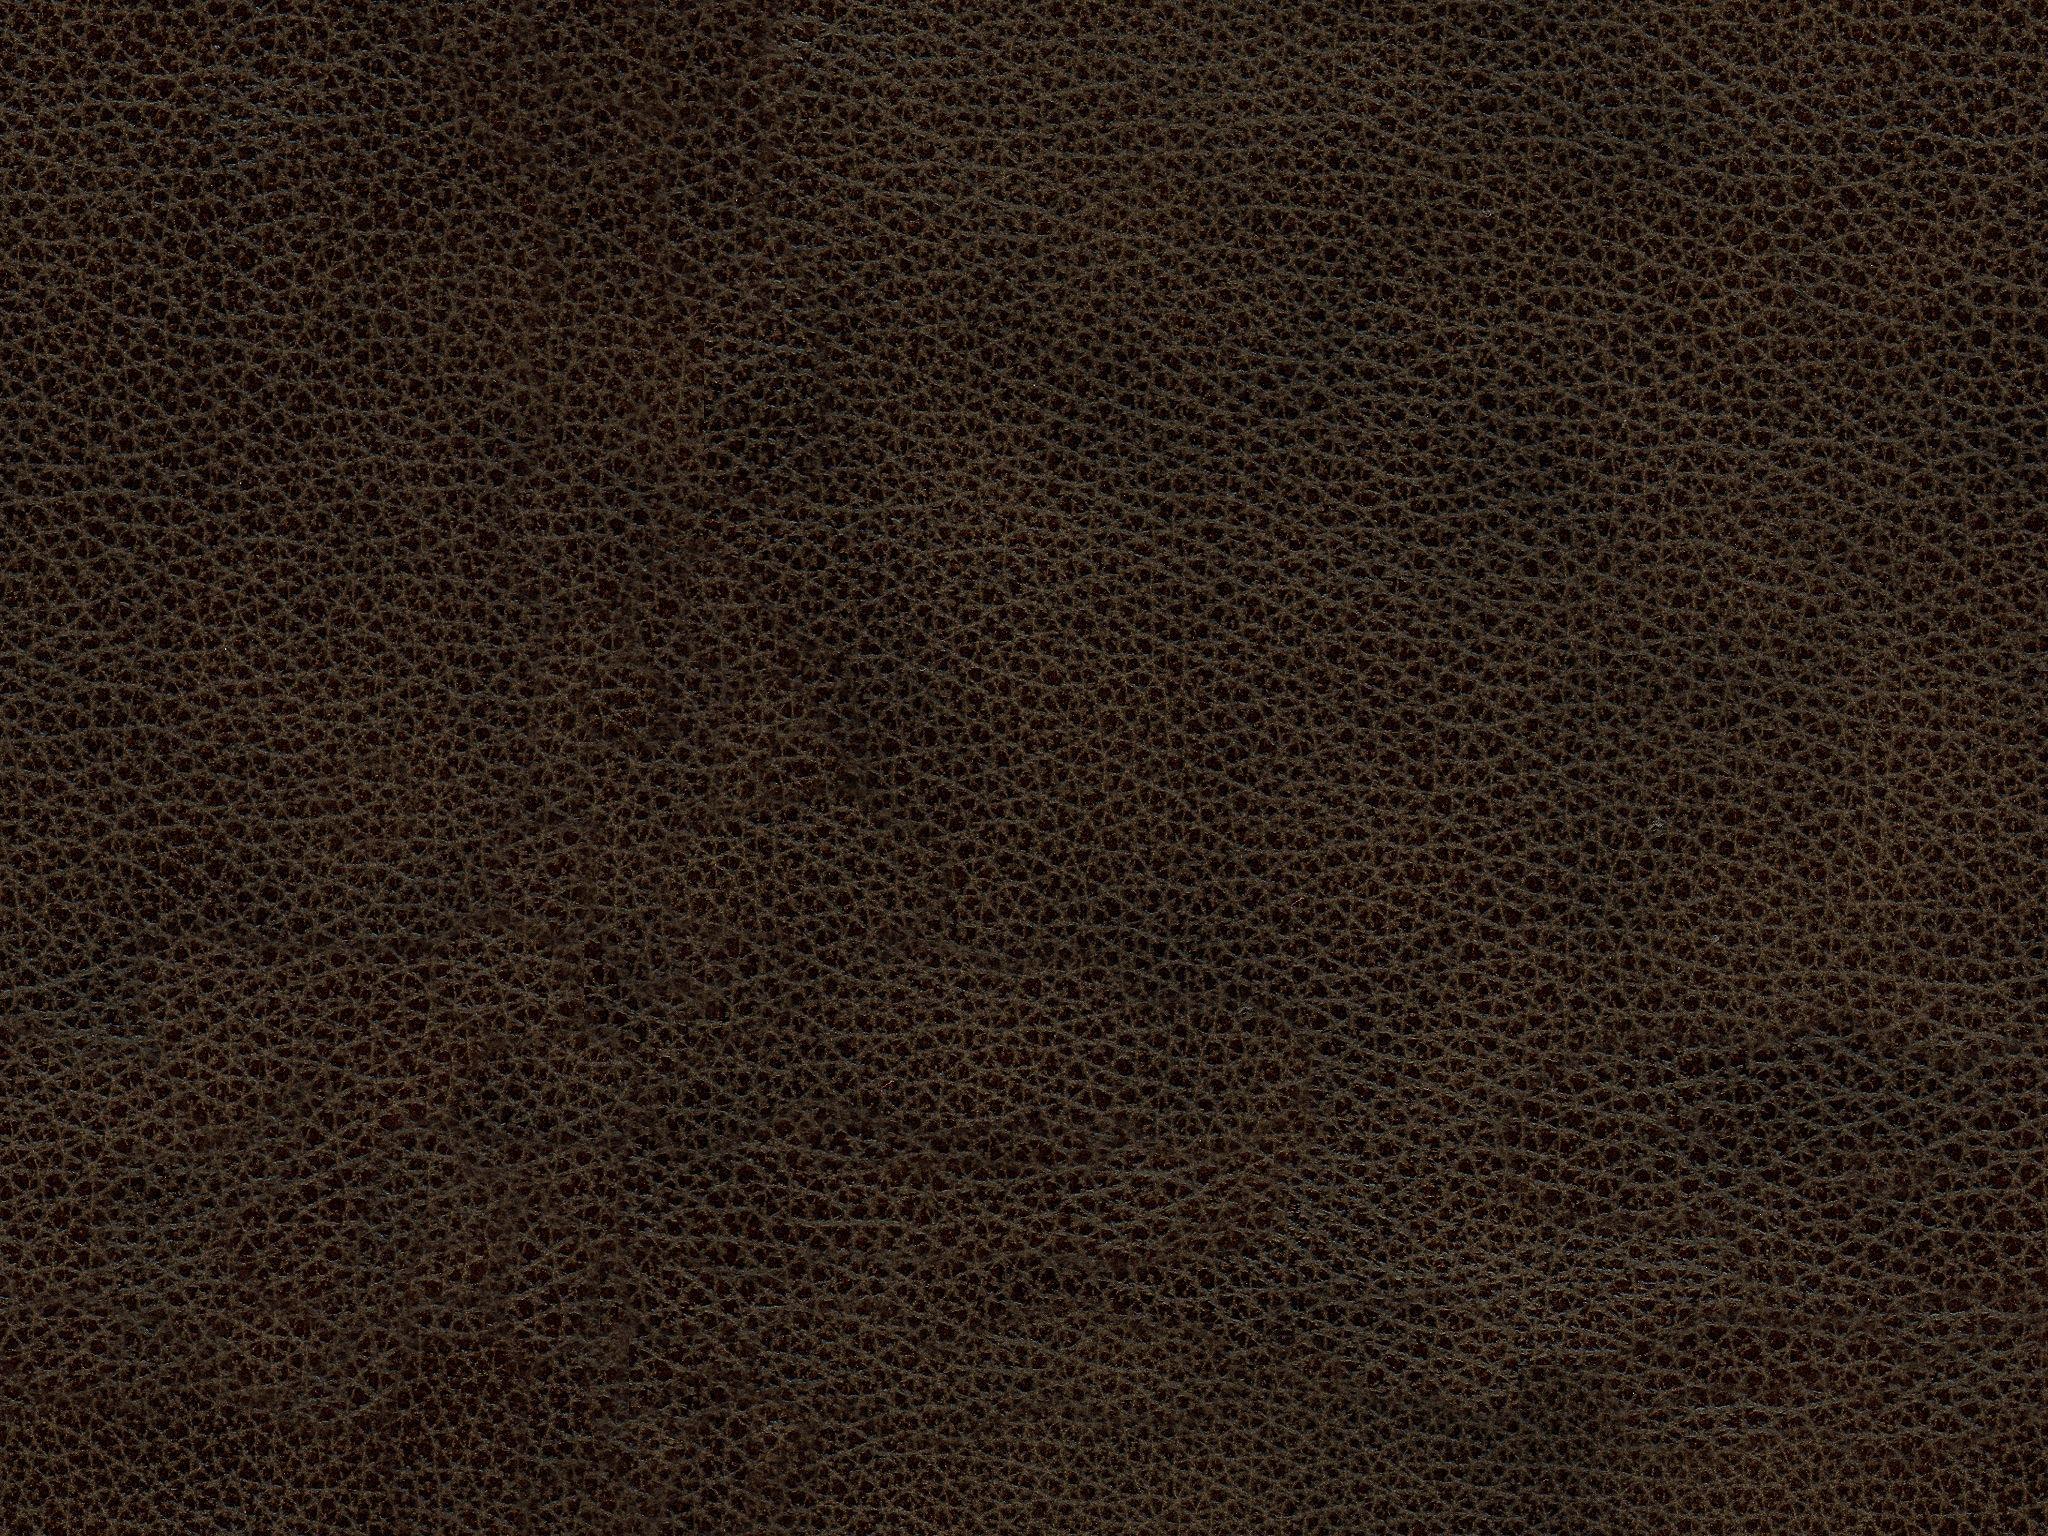 Elements International Torino Leather Saddle Brown 320